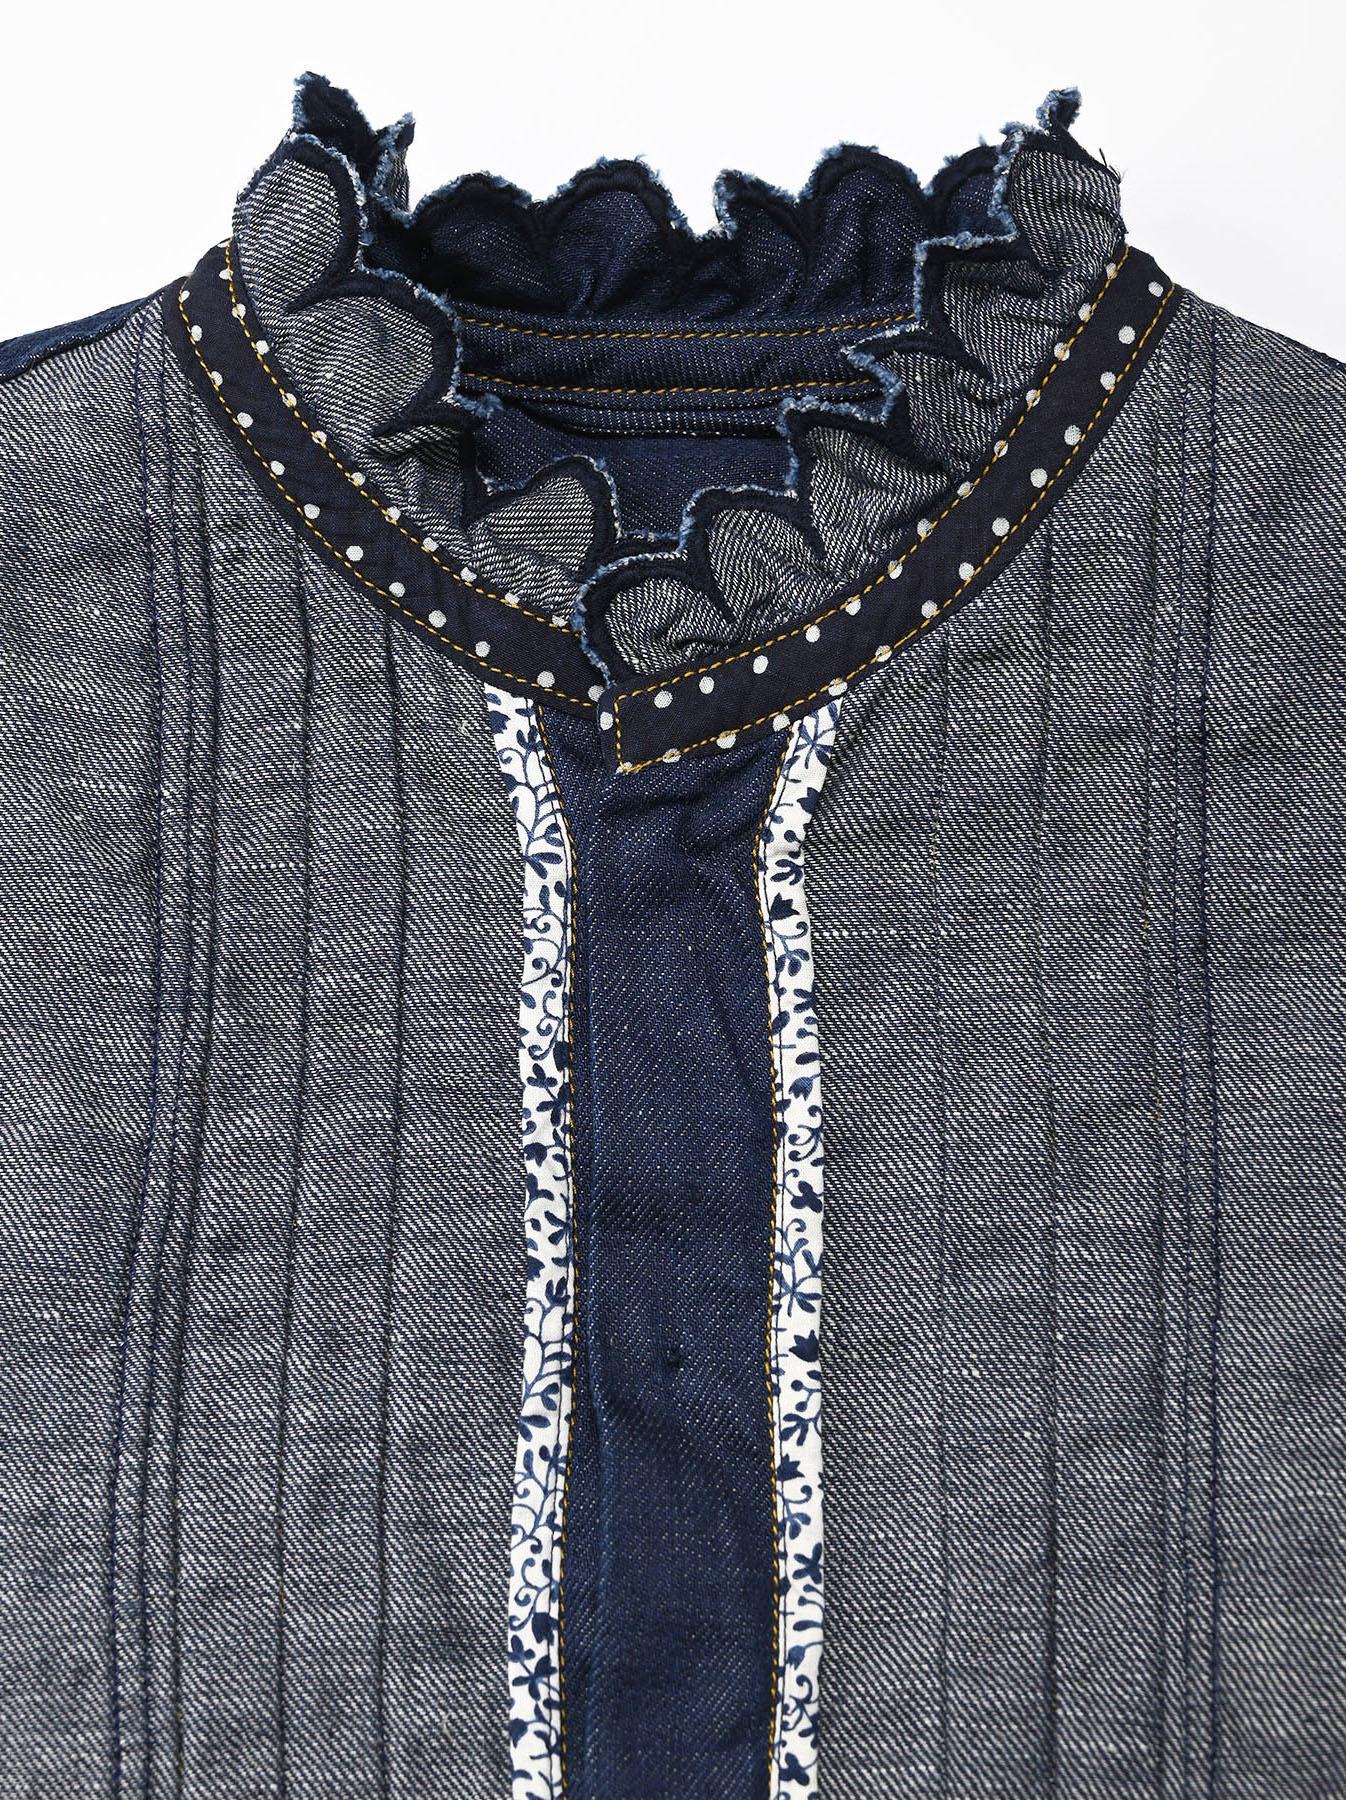 Komugi Denim Tuck Lace Blouse-11